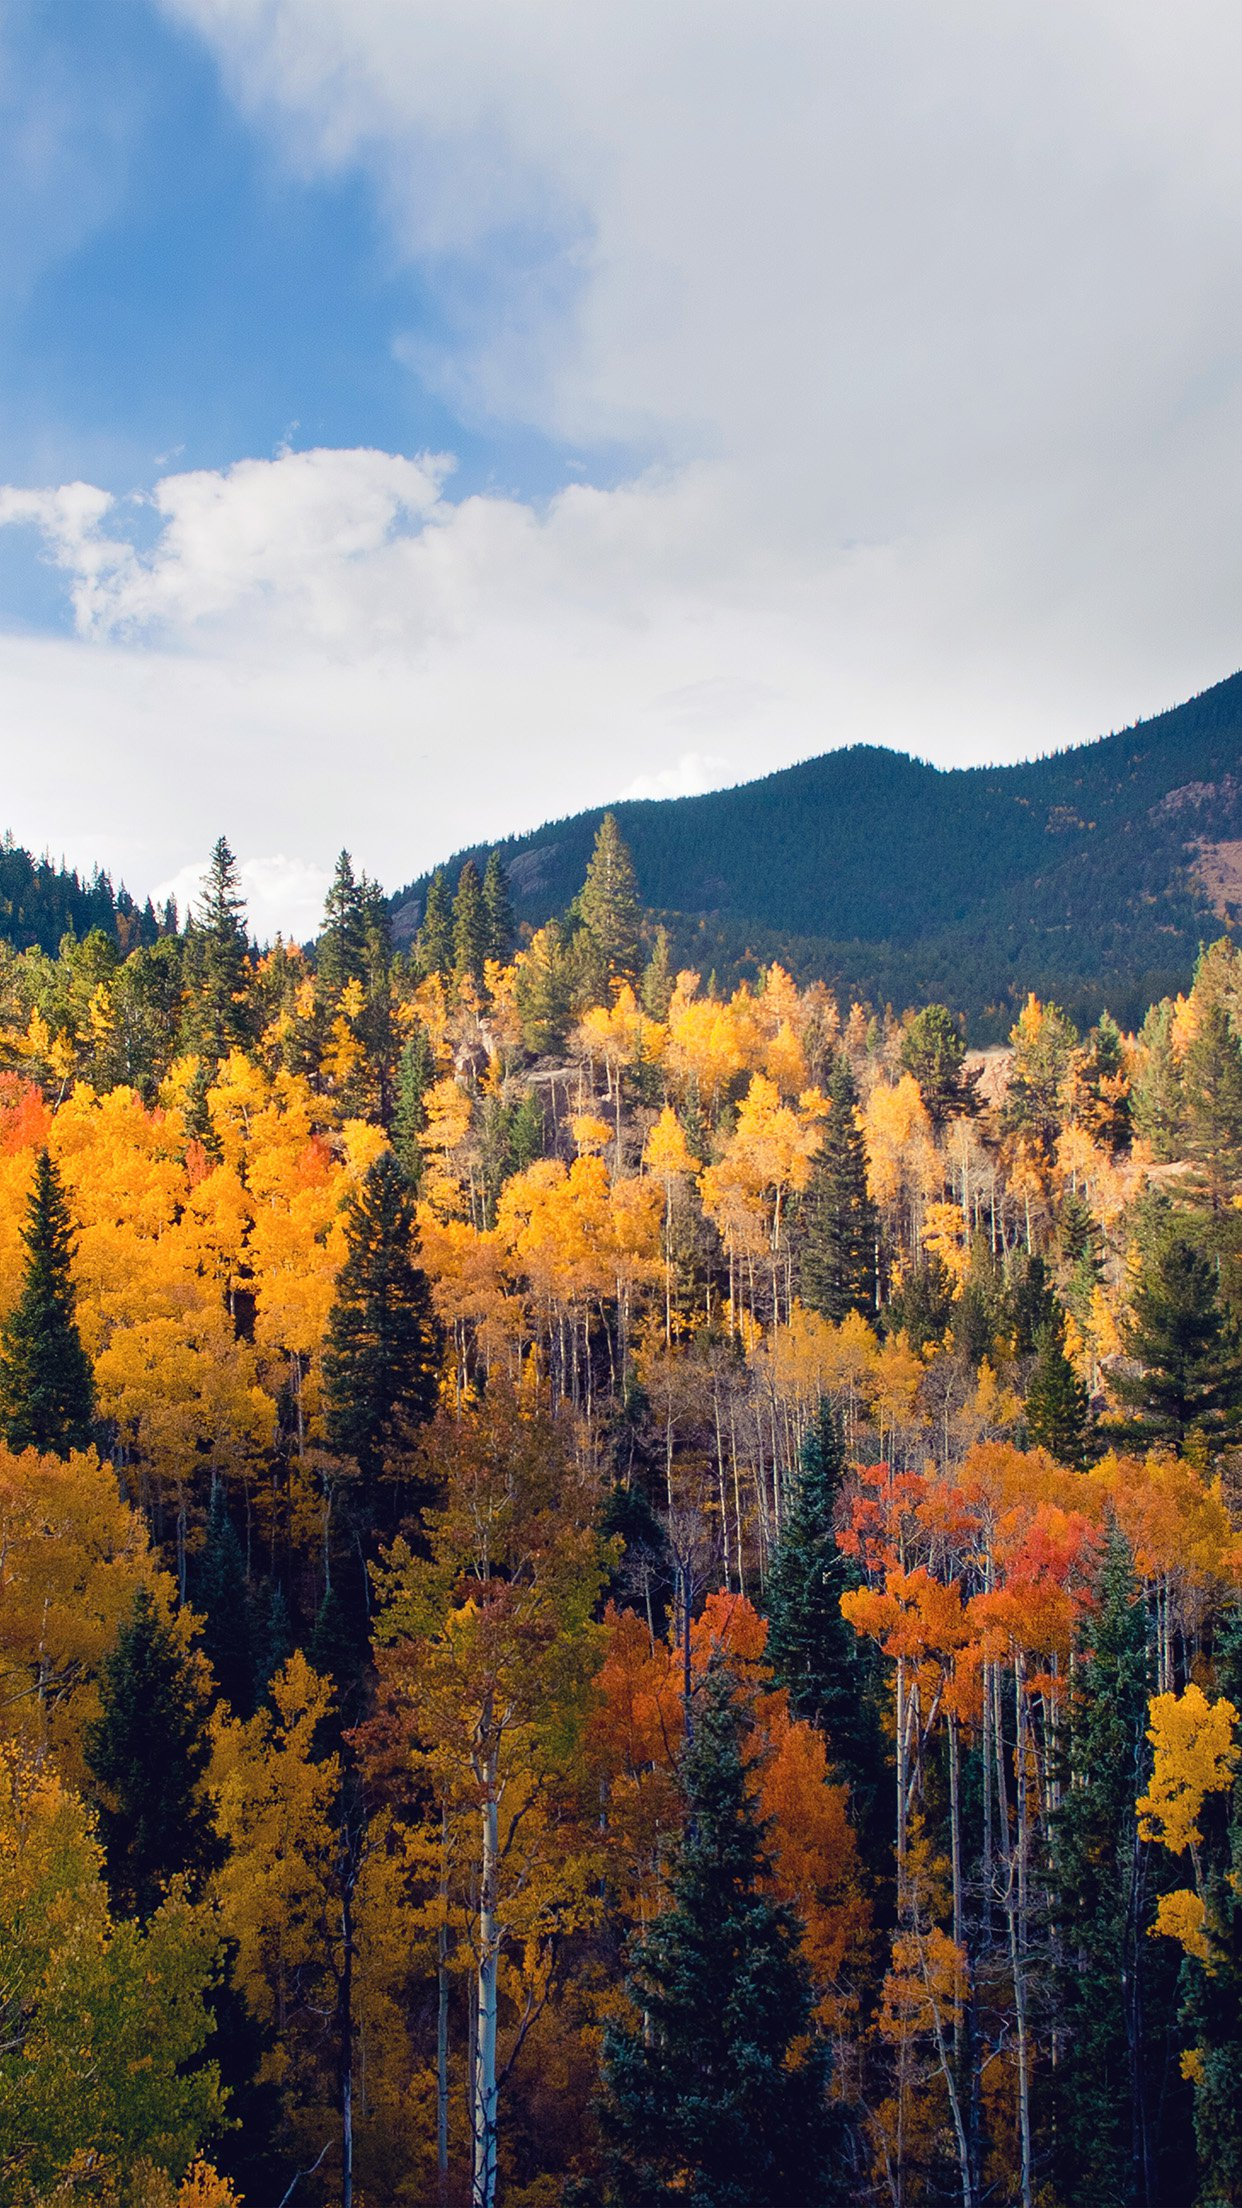 Autumn Iphone Wallpaper Pic Hwb13508 - Fall Trees Wallpaper Iphone , HD Wallpaper & Backgrounds